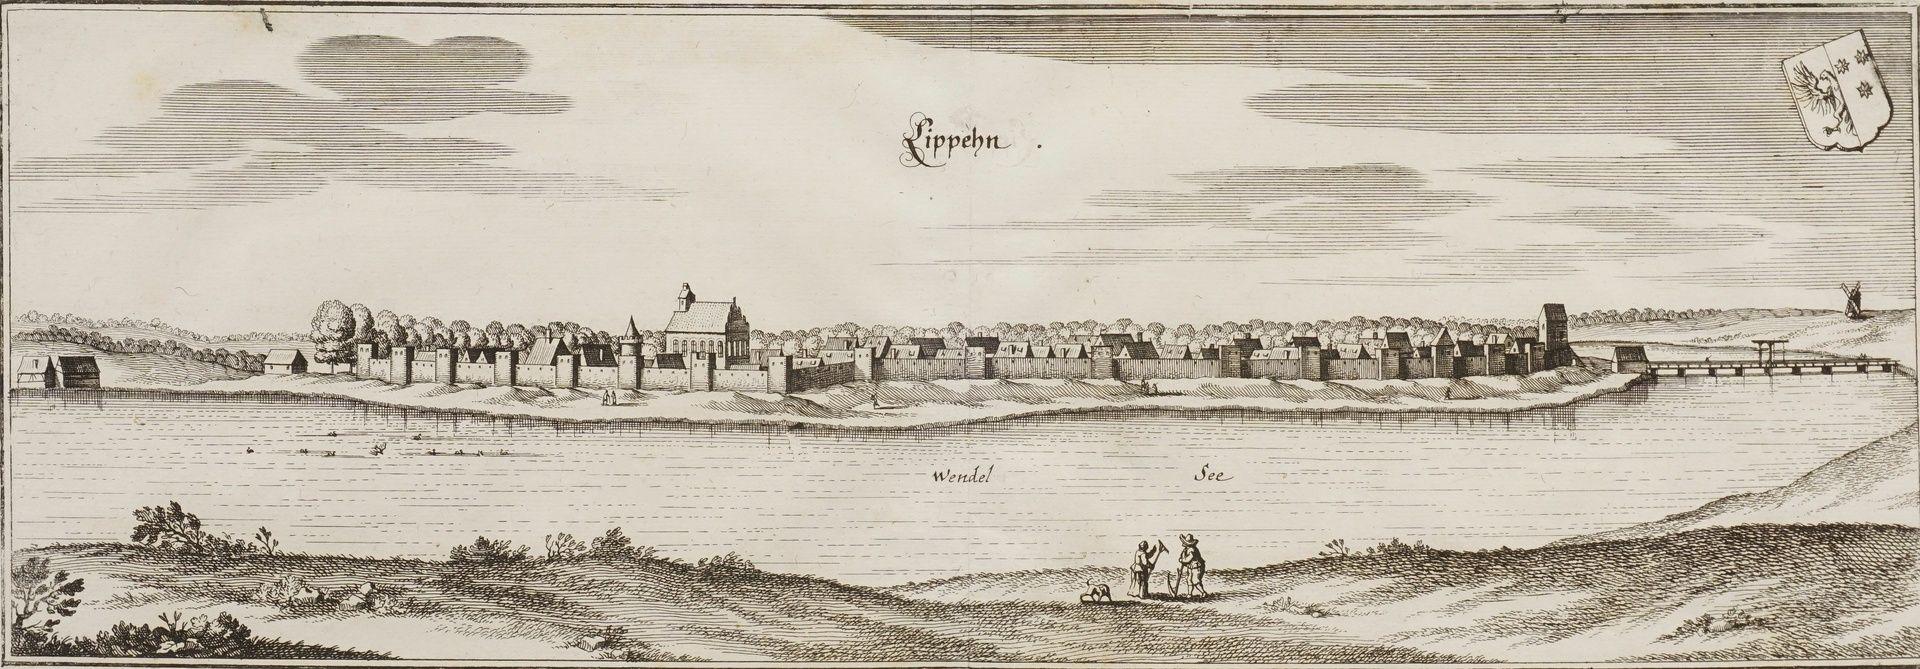 "Matthäus Merian, ""Lippehn"" (Lipiany, Westpommern)"